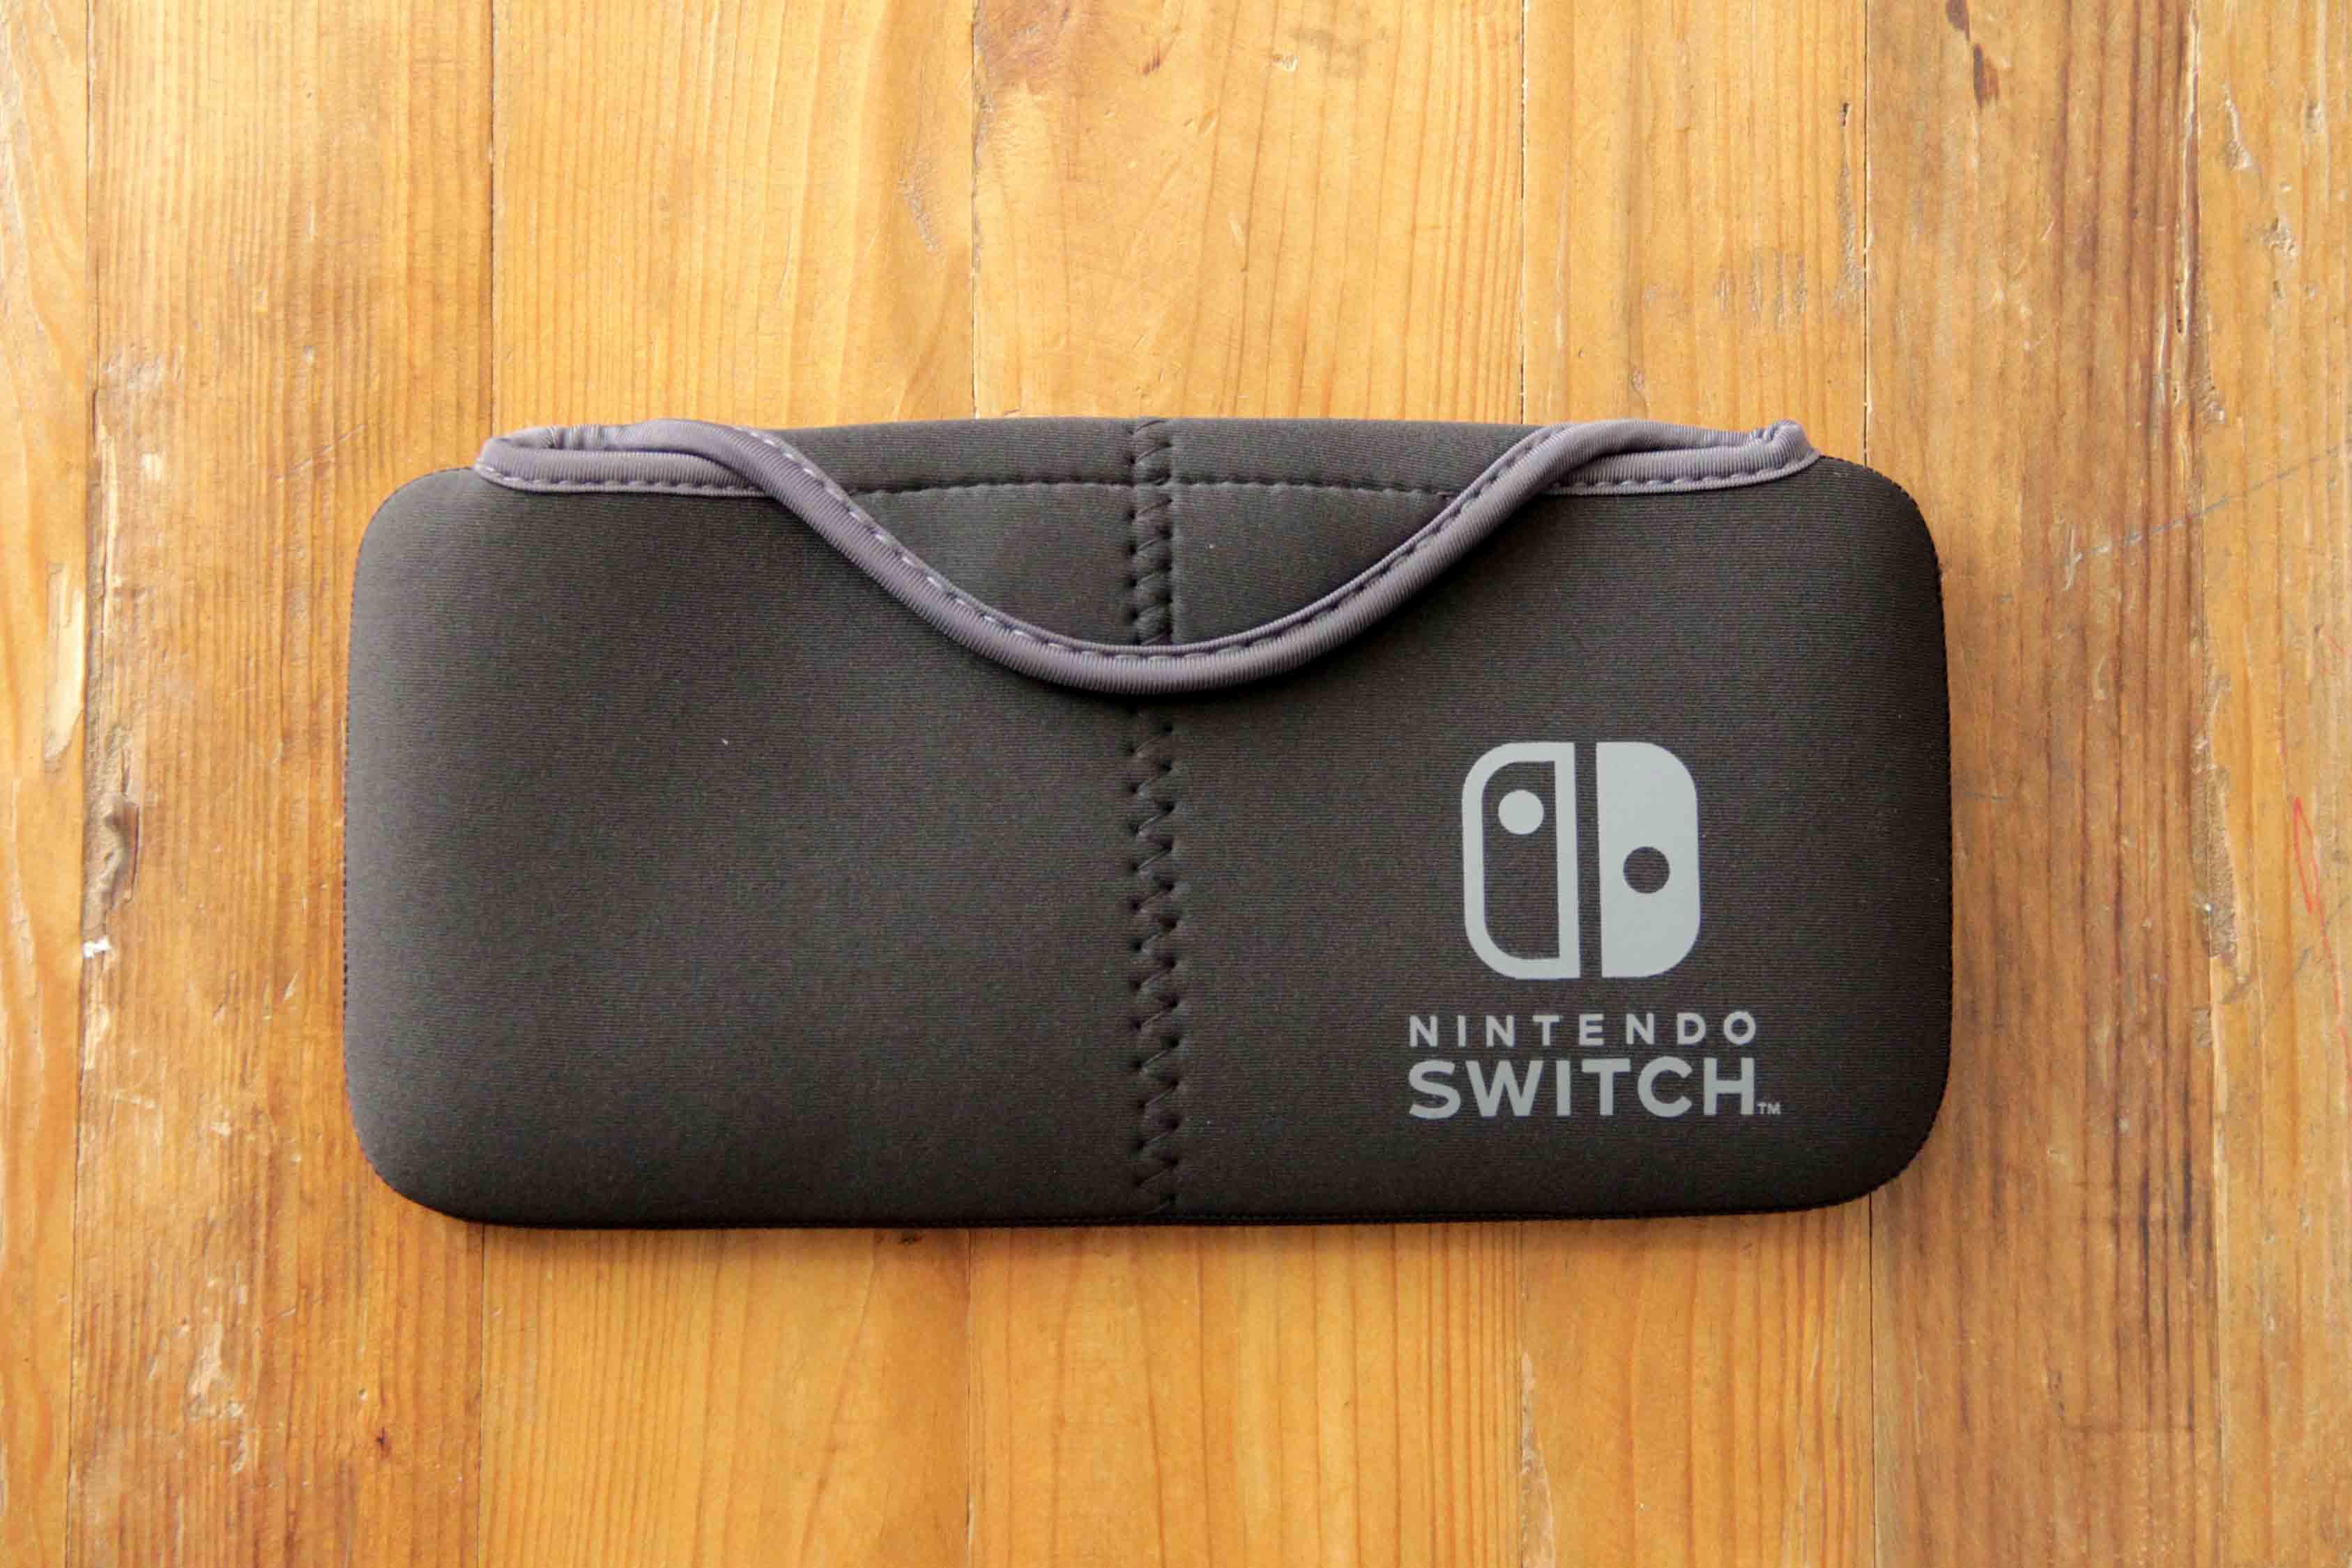 Nintendo switch専用ケースポーチ|QUICK POUCH本体正面画像